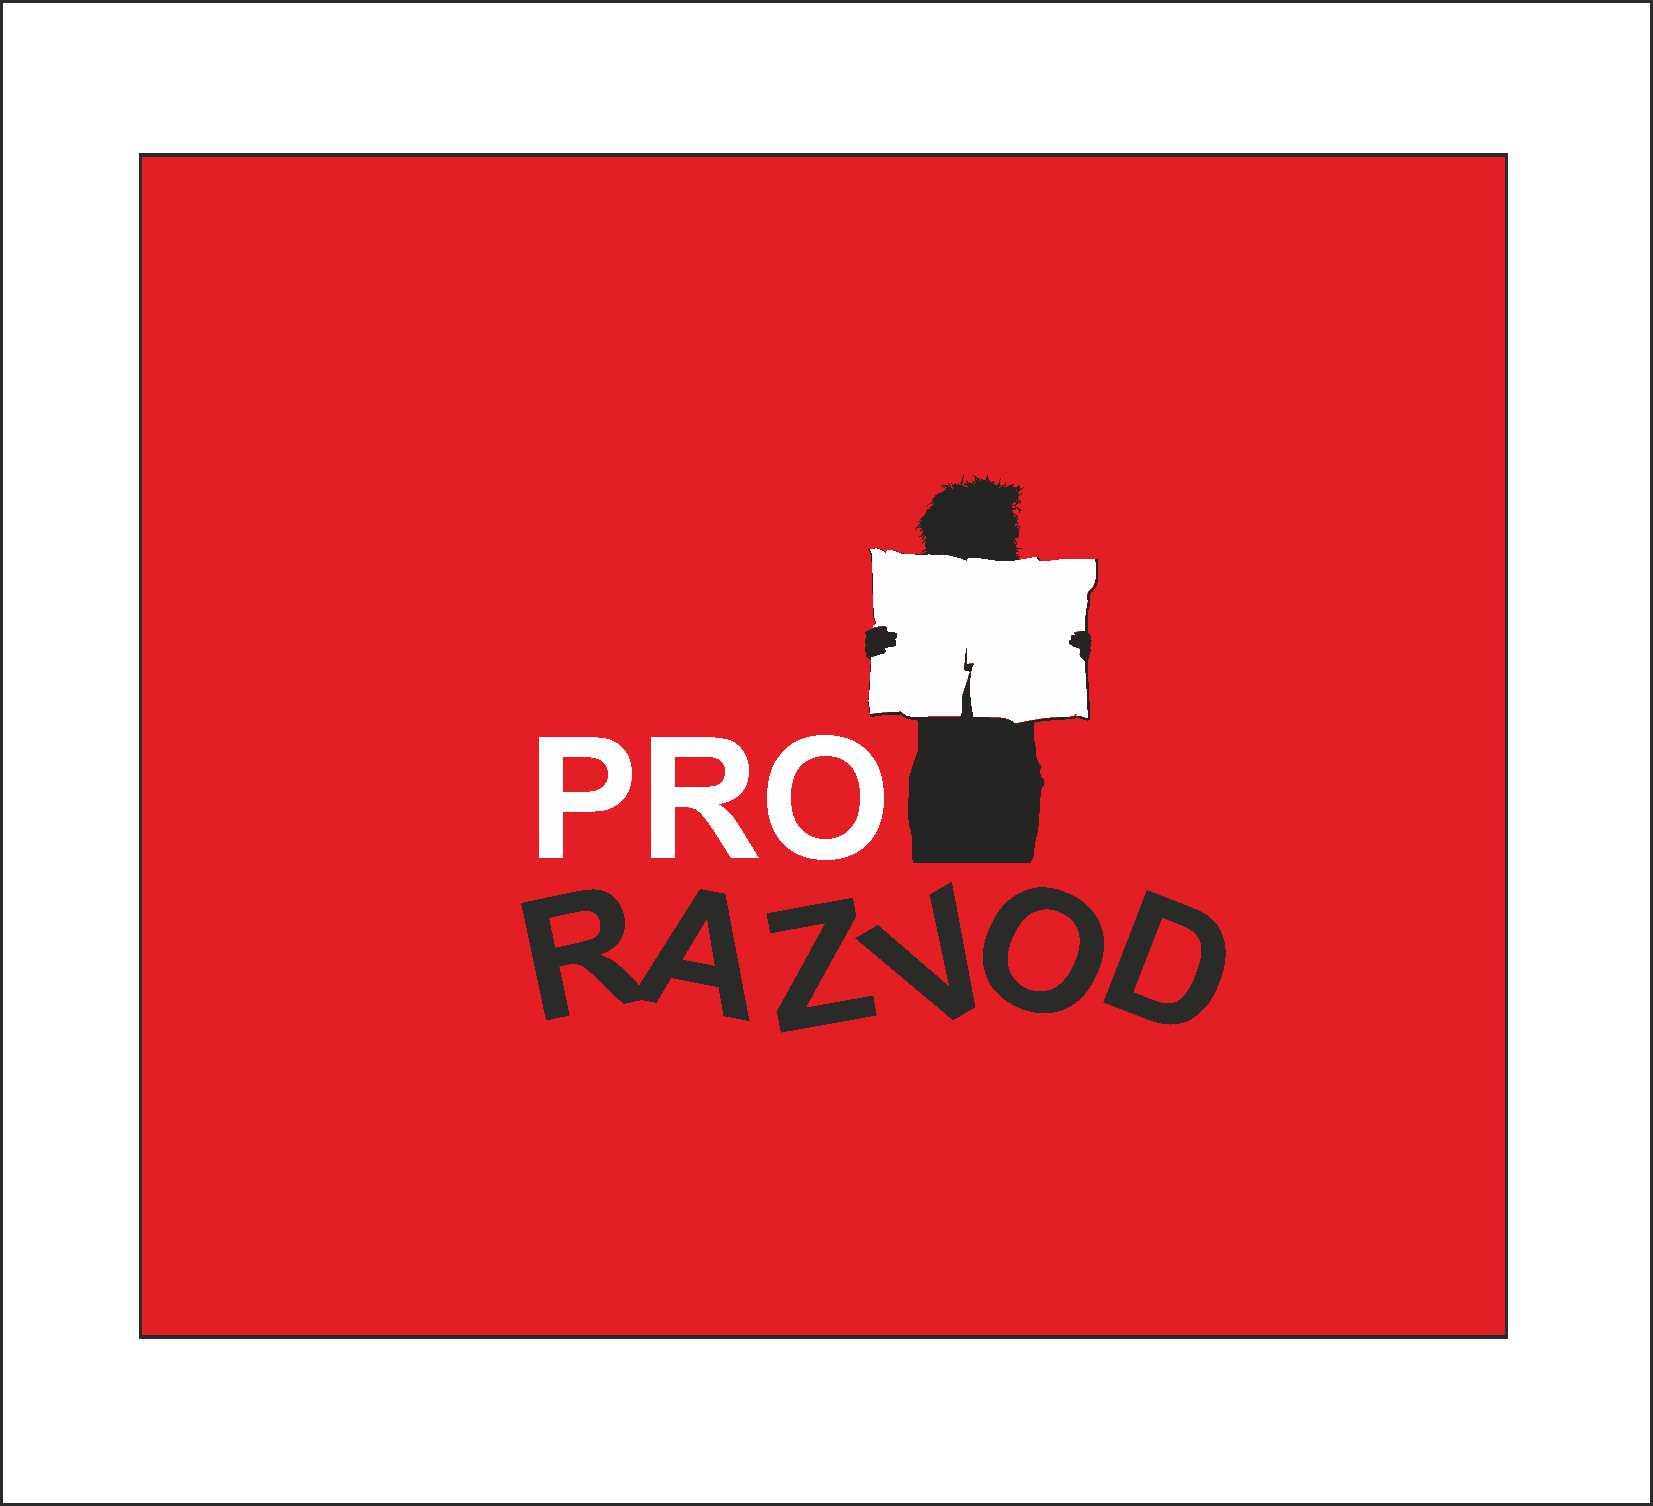 Логотип и фирм стиль для бракоразводного агенства. фото f_0595875e64d46399.jpg